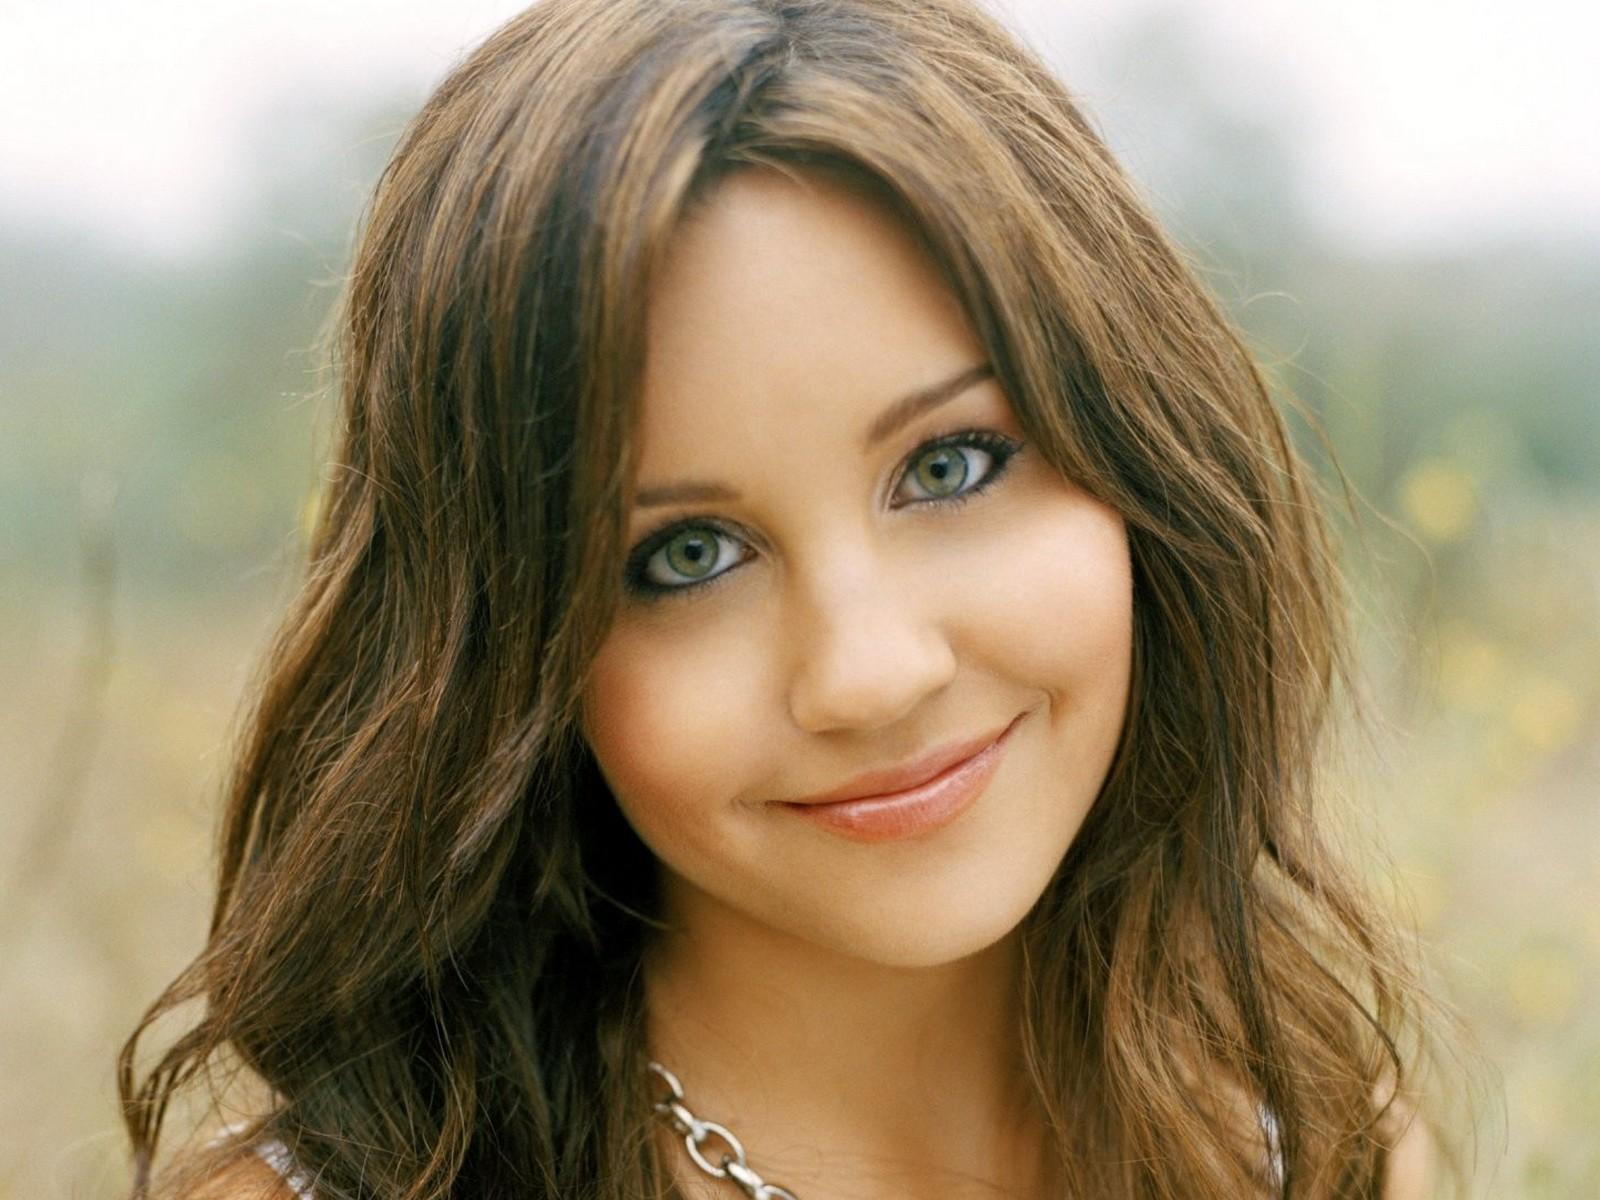 Full Hd Wallpapers 3d Hollywood Actress Full Hd 1600x1200 Download Hd Wallpaper Wallpapertip